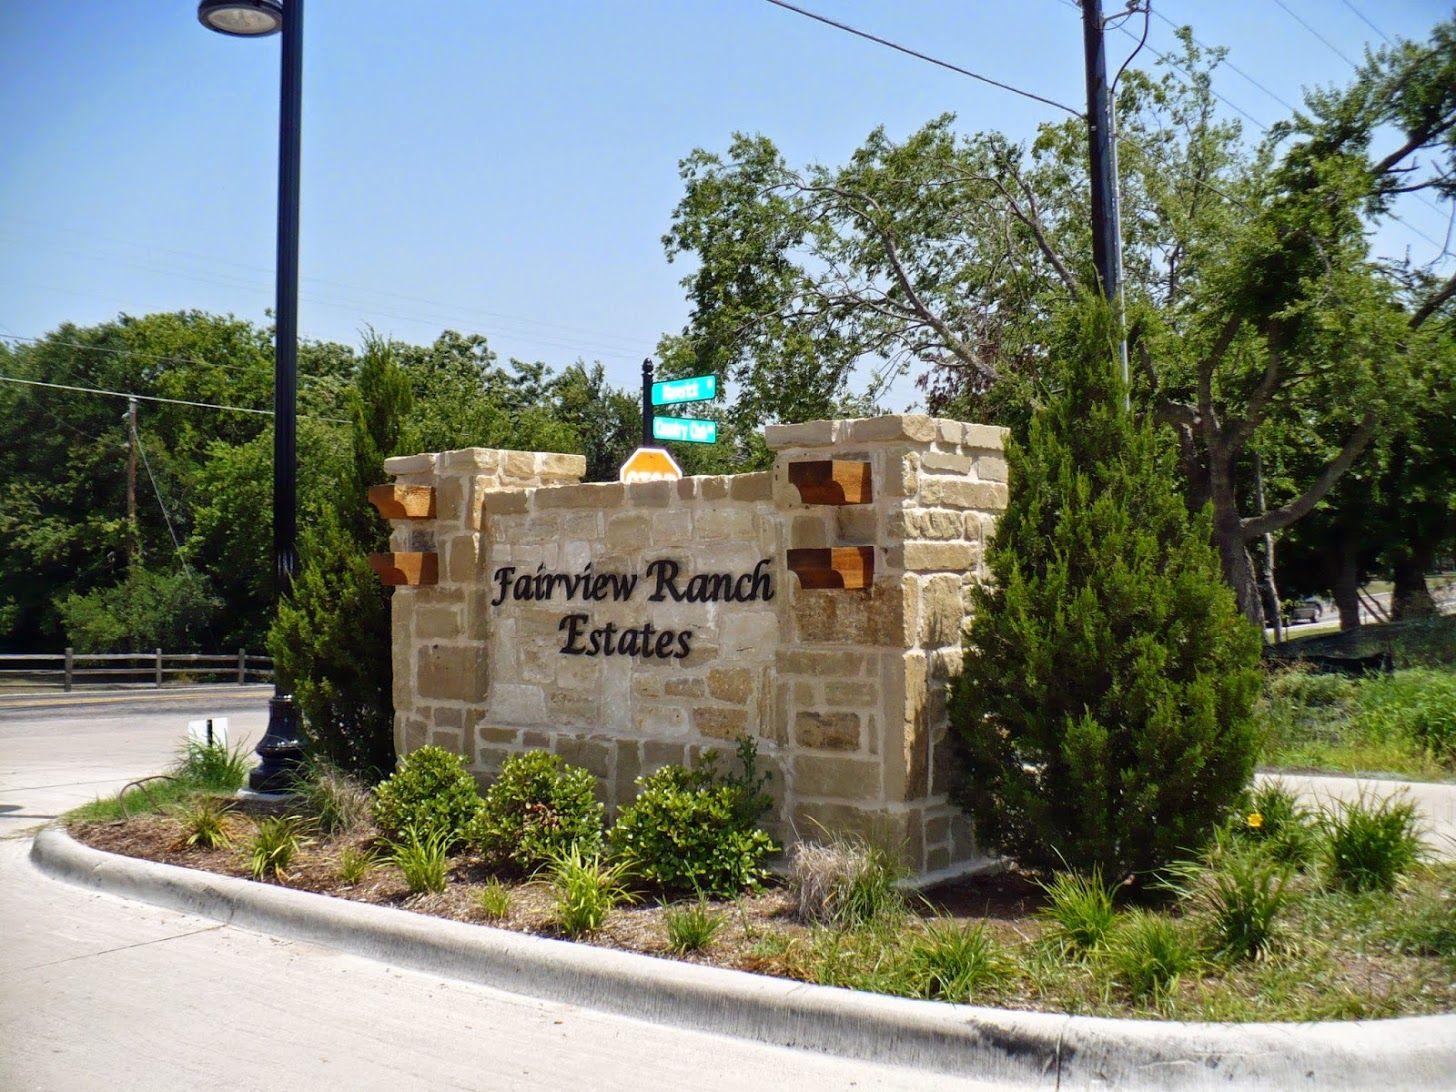 Fairview ranch estates fairview ranch estates